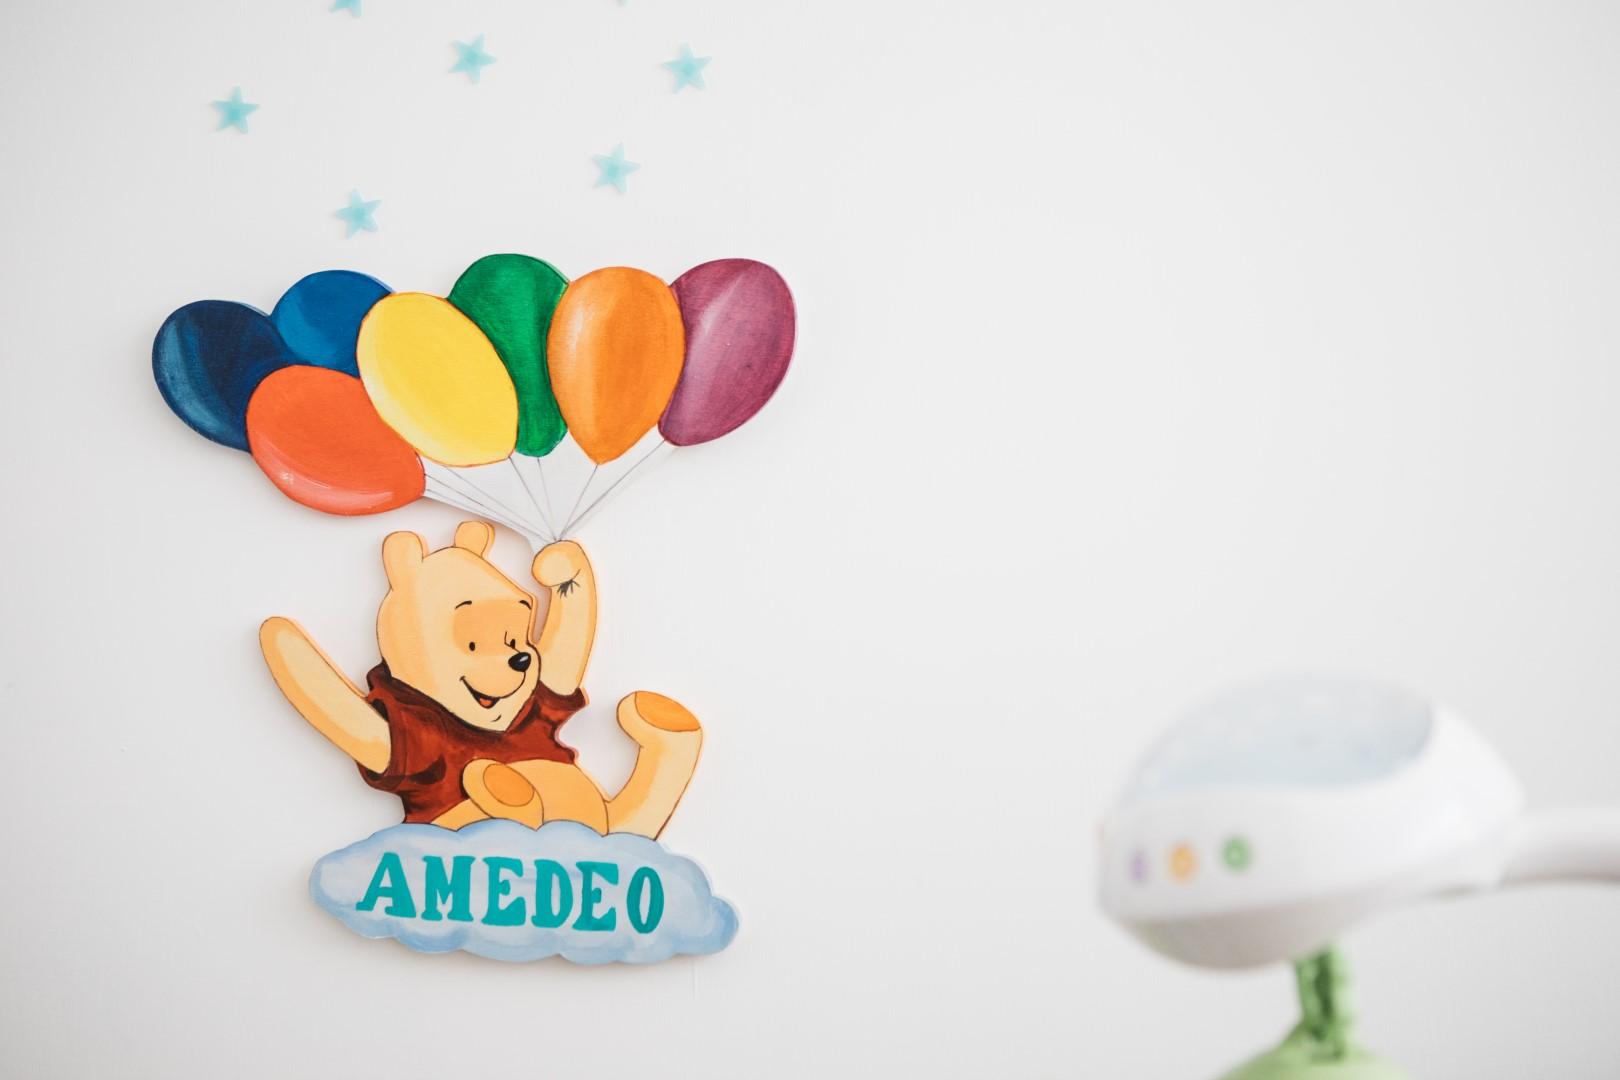 amedeo-132.jpg